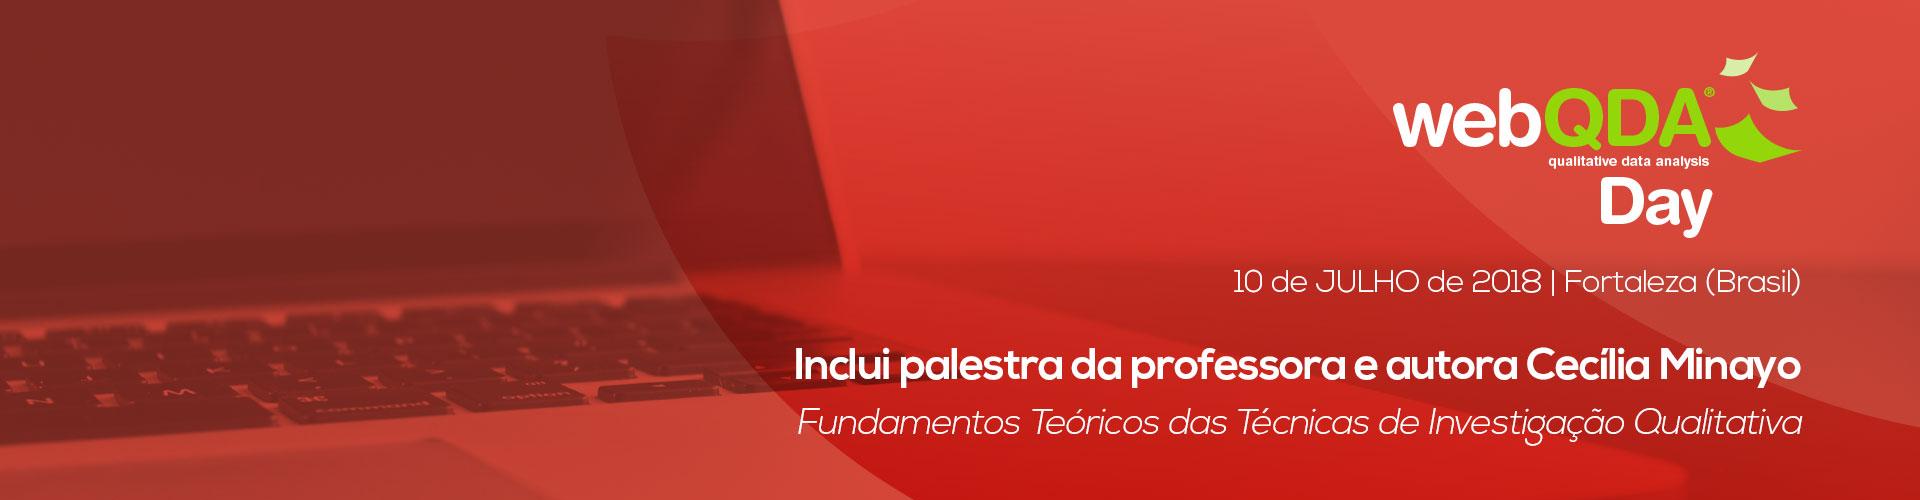 webQDA Day Fortaleza